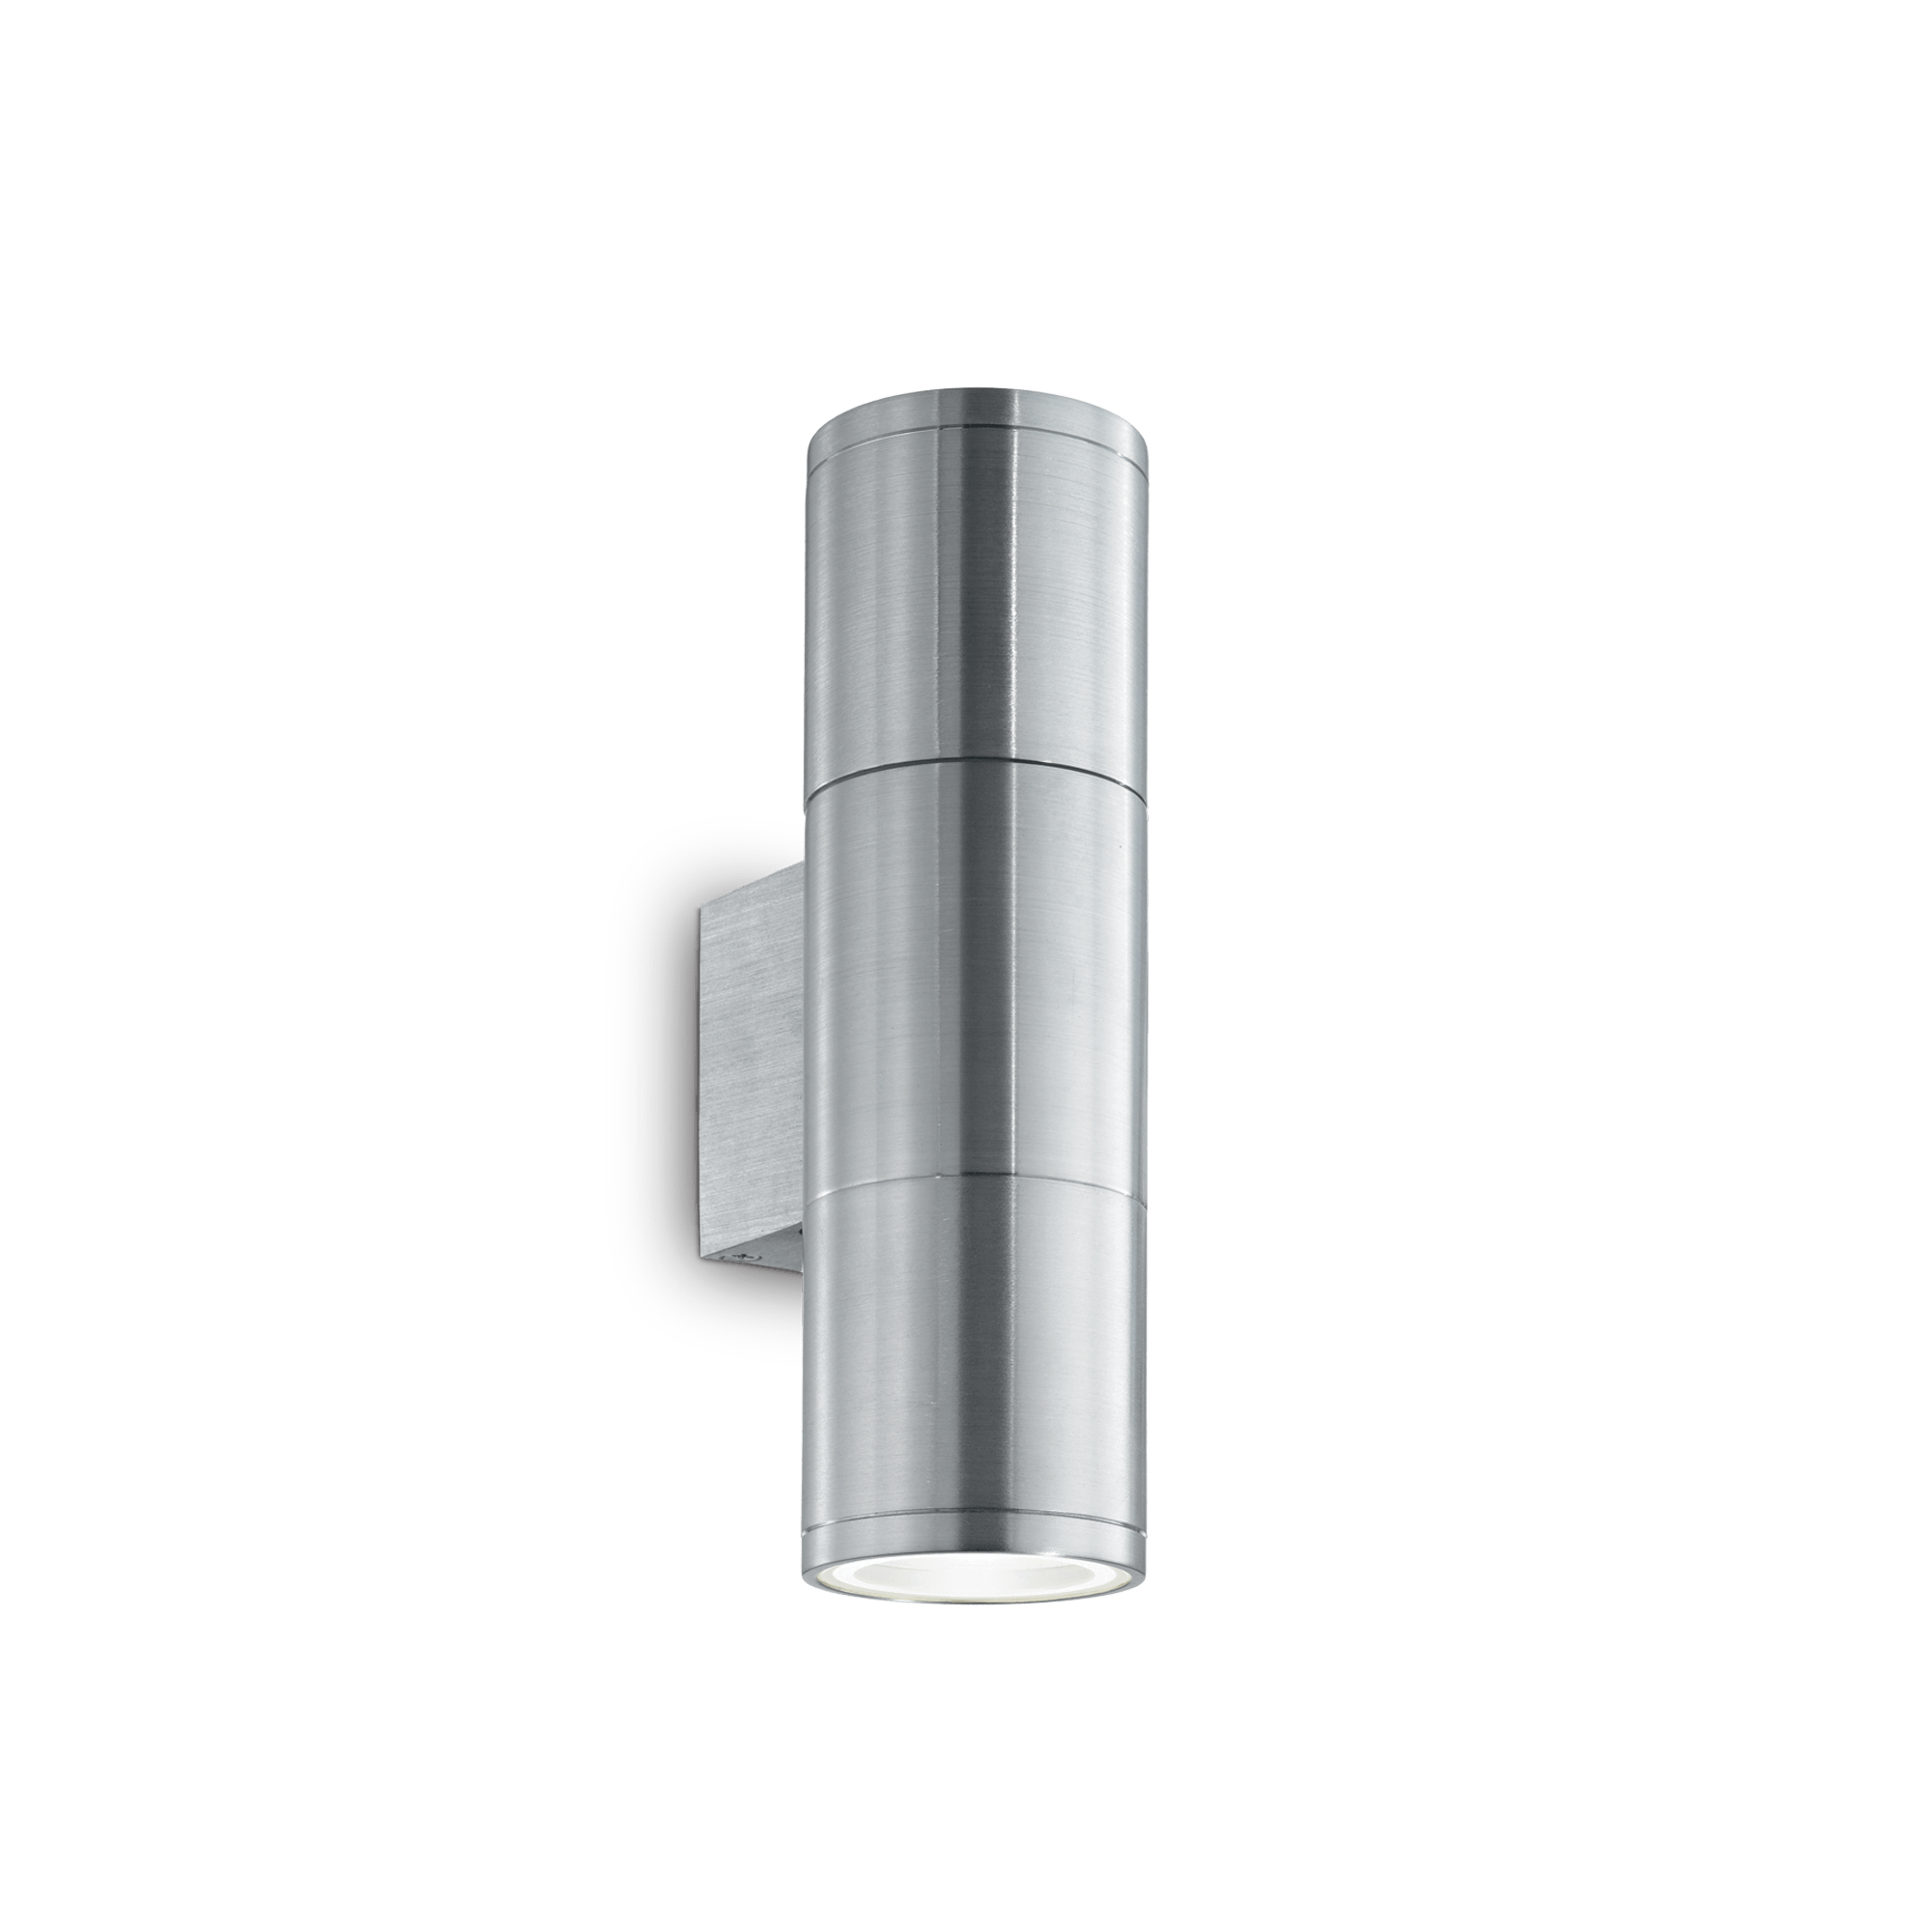 Ideal Lux 033013 Gun AP2 Small Alluminio kültéri falilámpa